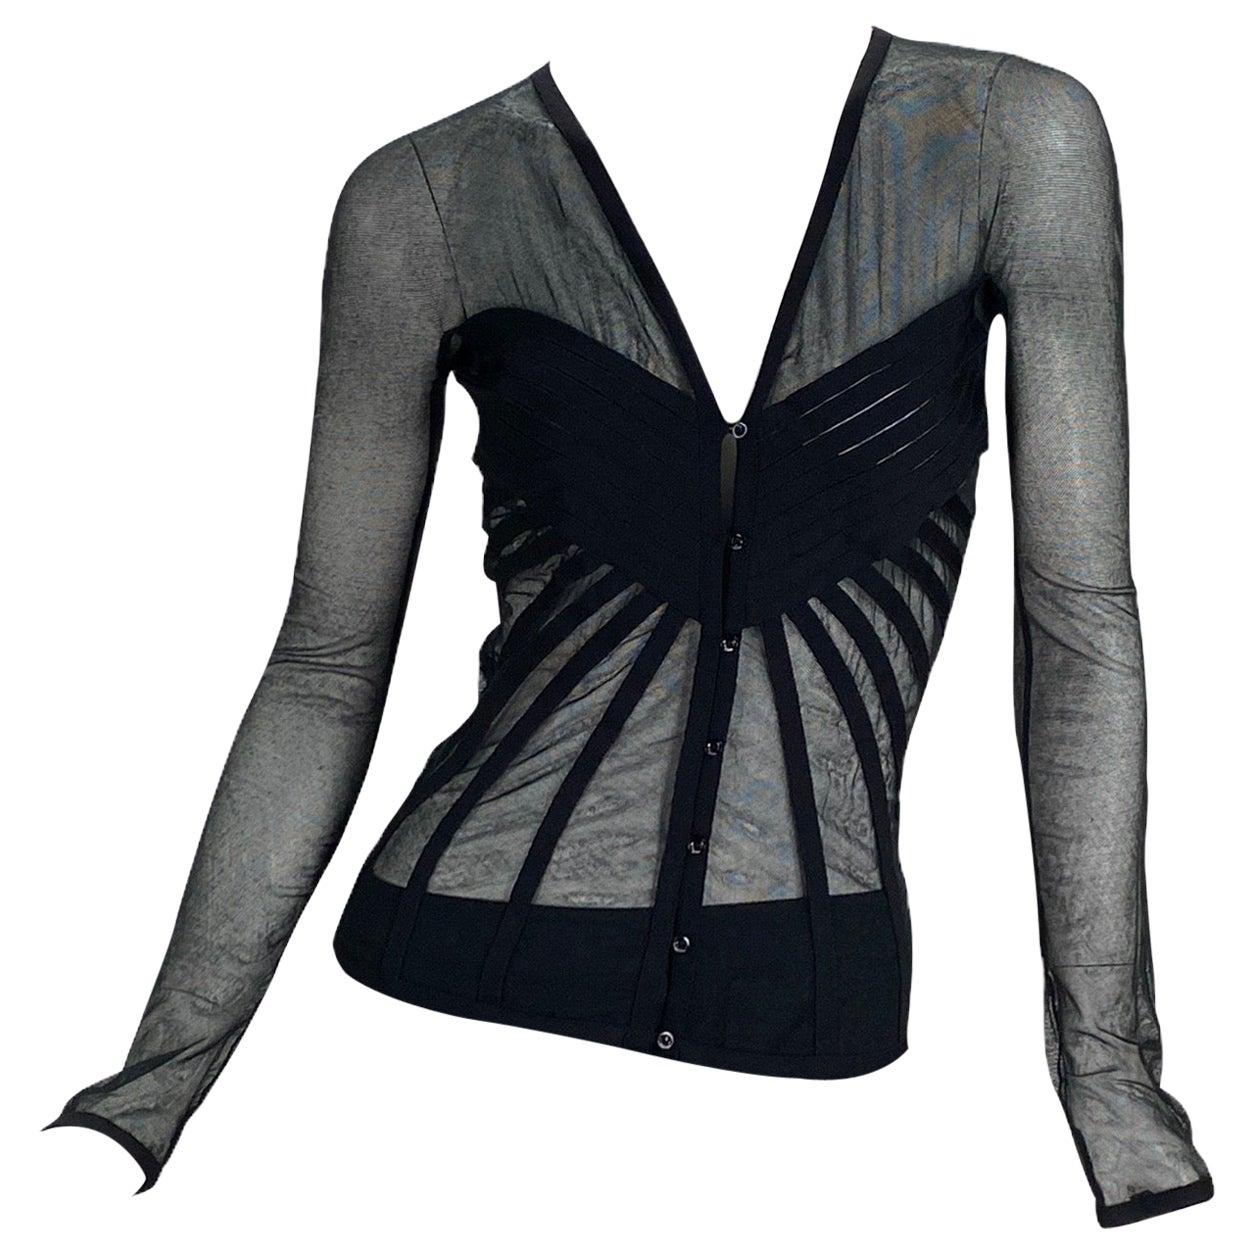 Vintage John Galliano for Christian Dior Black Tulle Cardigan Top